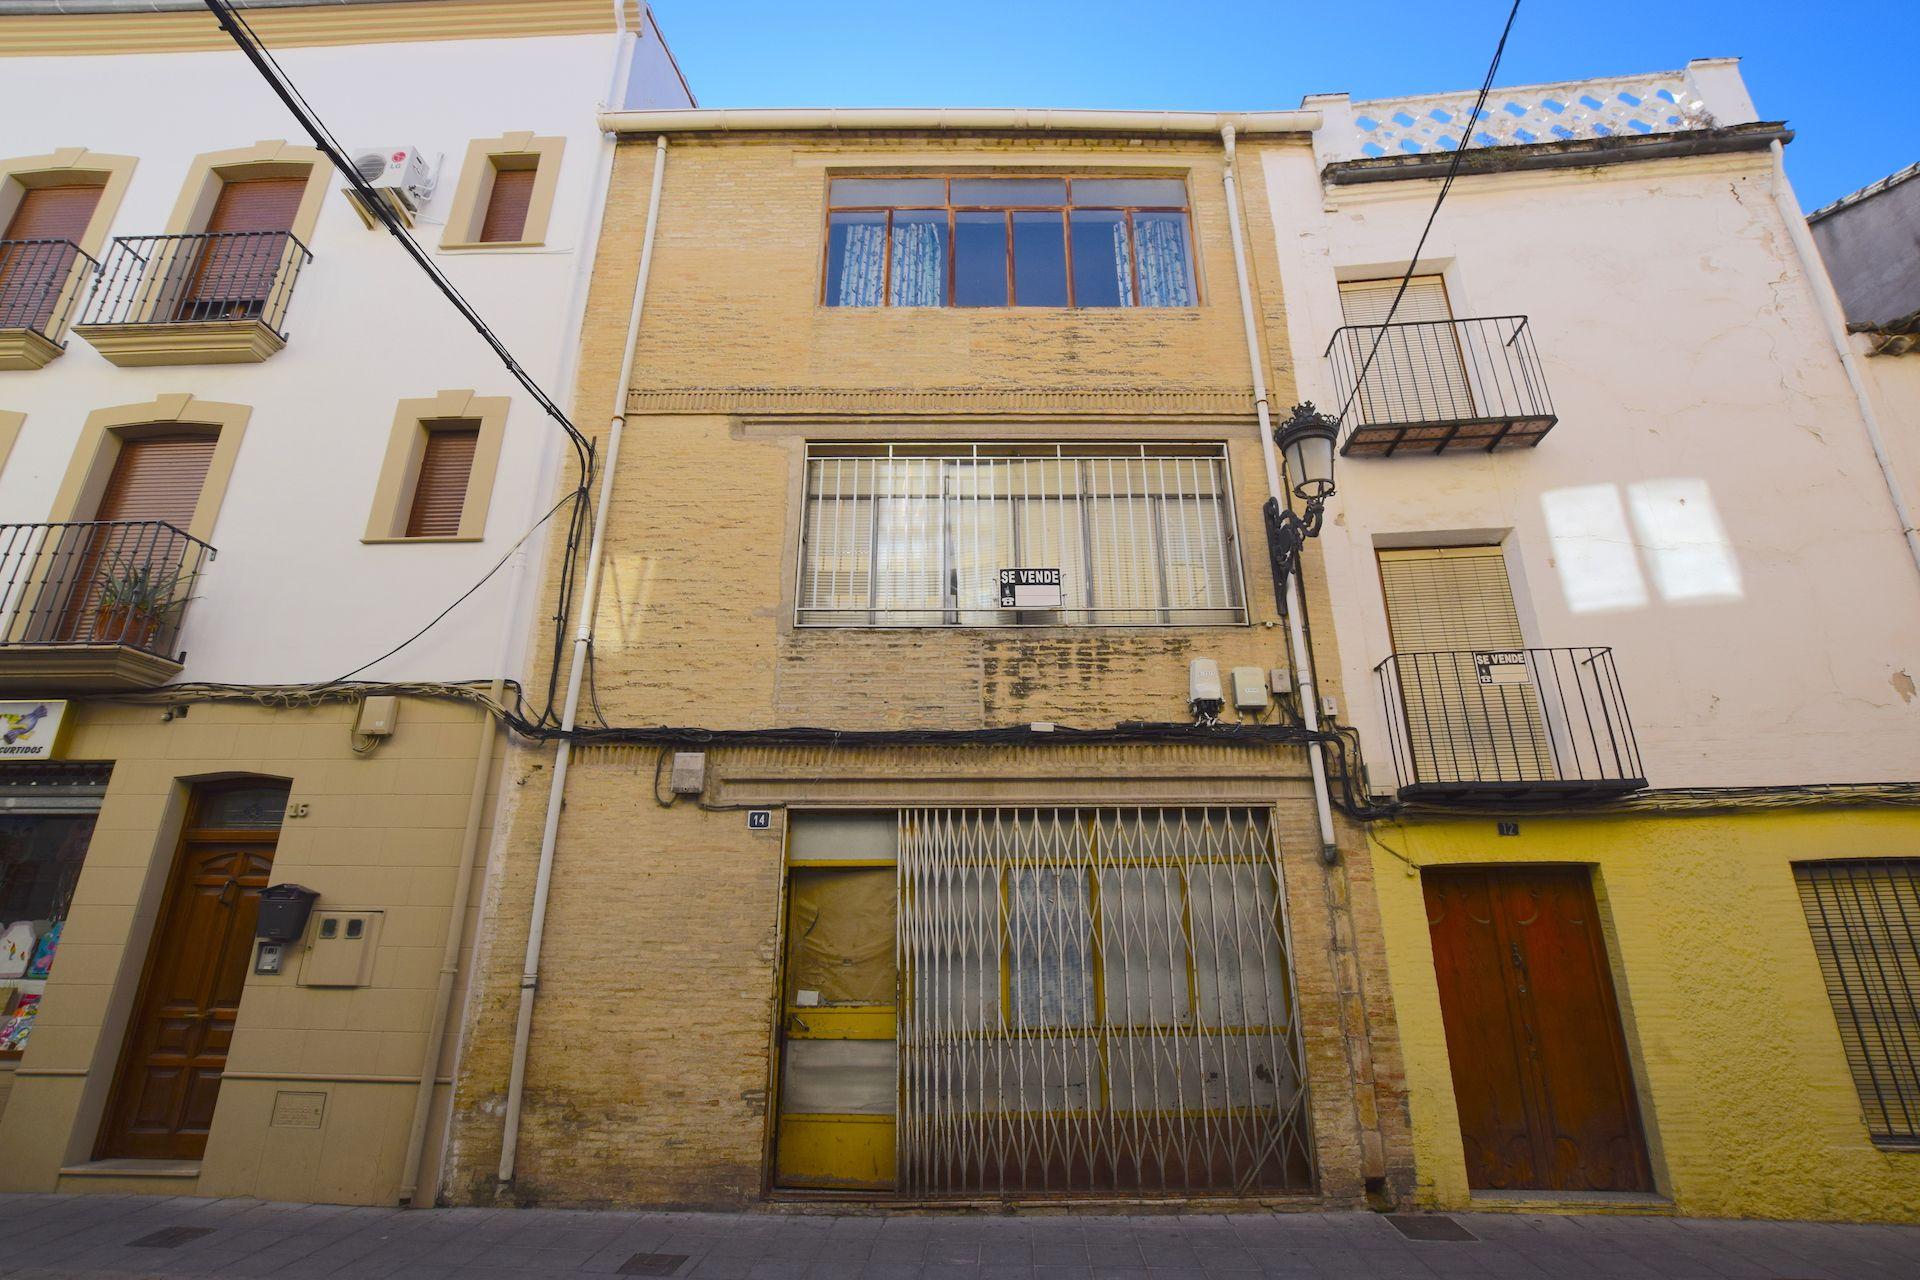 Buildings in Villacarrillo, for sale